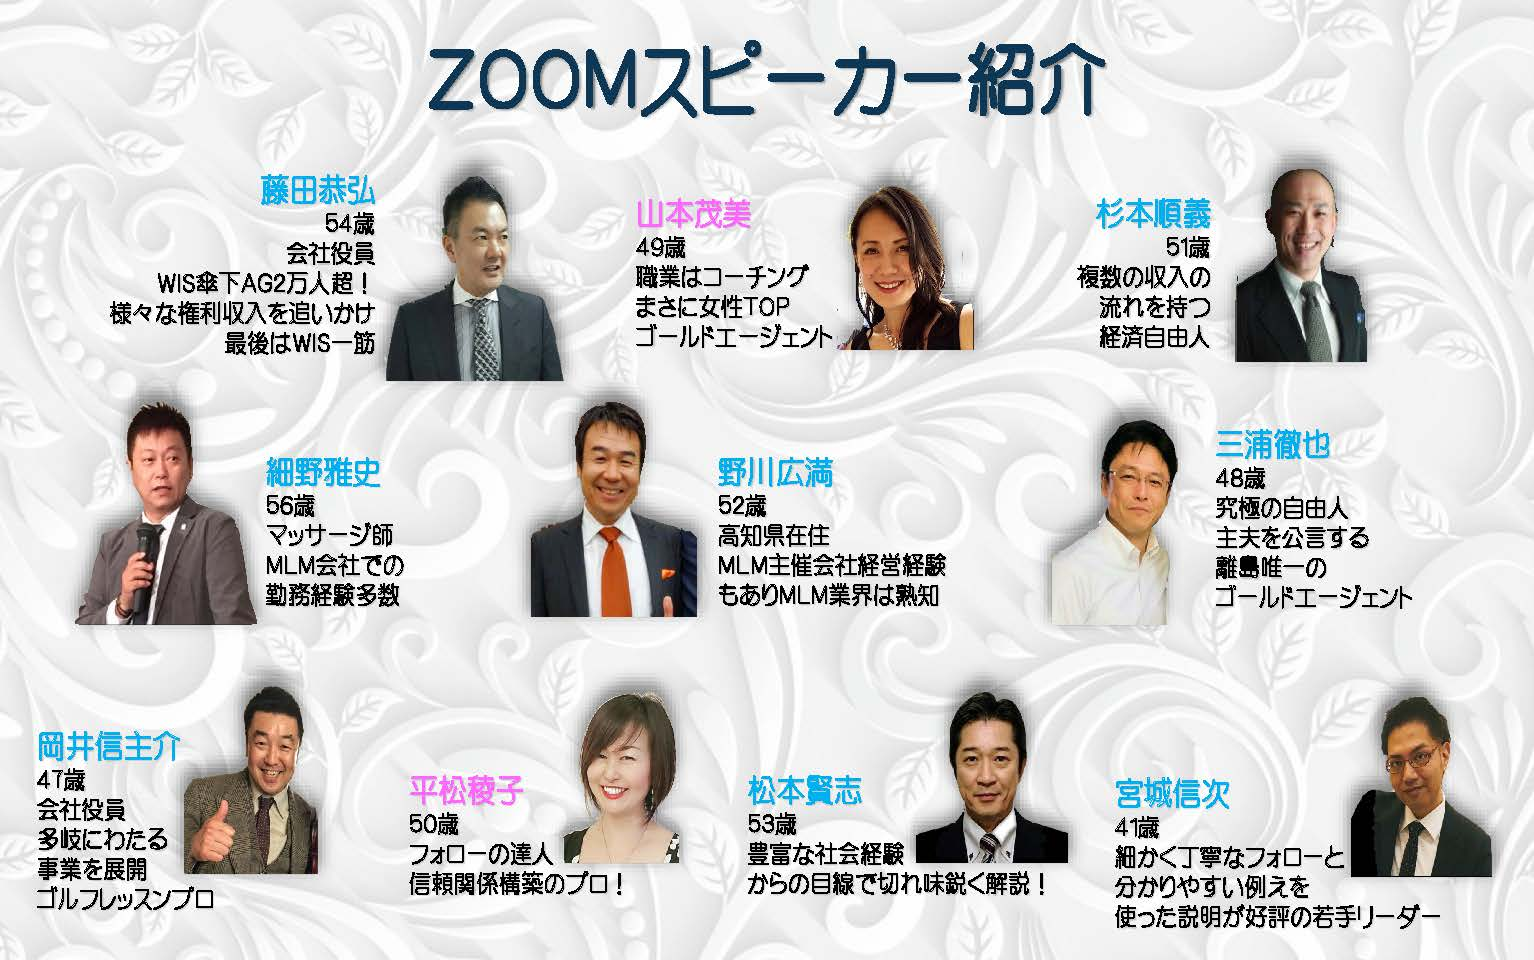 ZOOMスピーカー紹介2020年4月